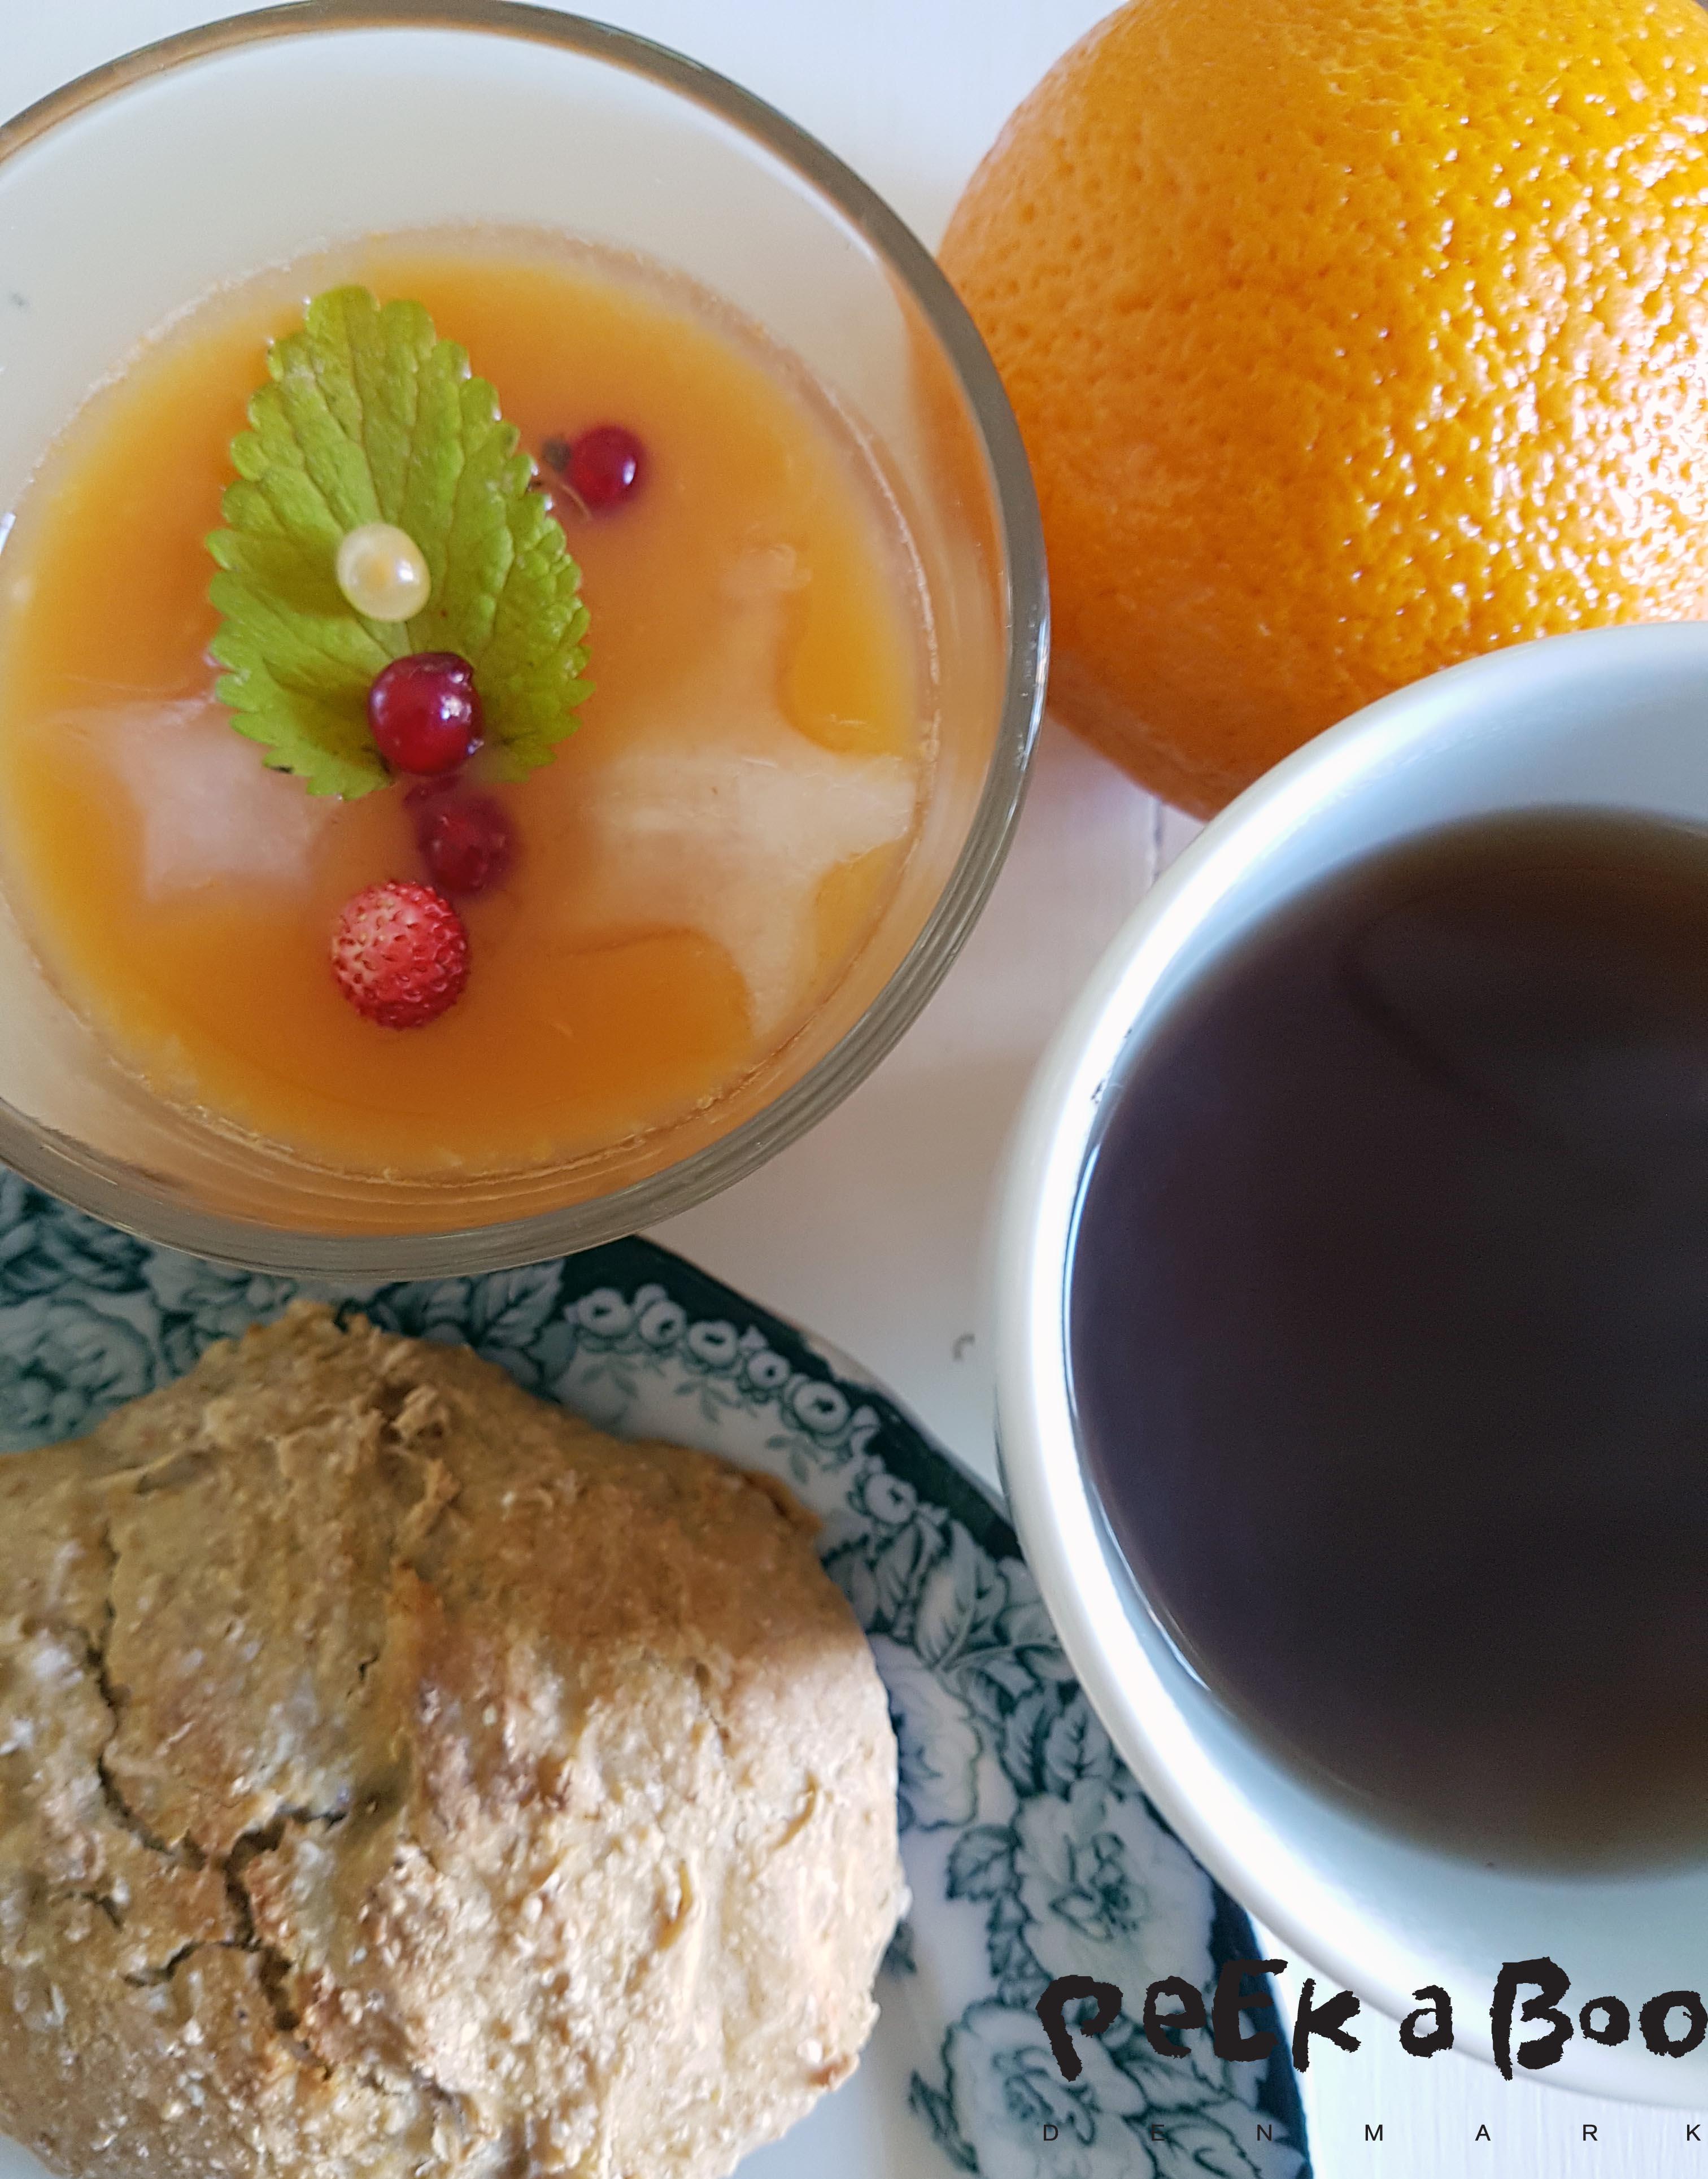 Breakfast is served ! Easy vitamin boost.Breakfast is served ! Easy vitamin boost.